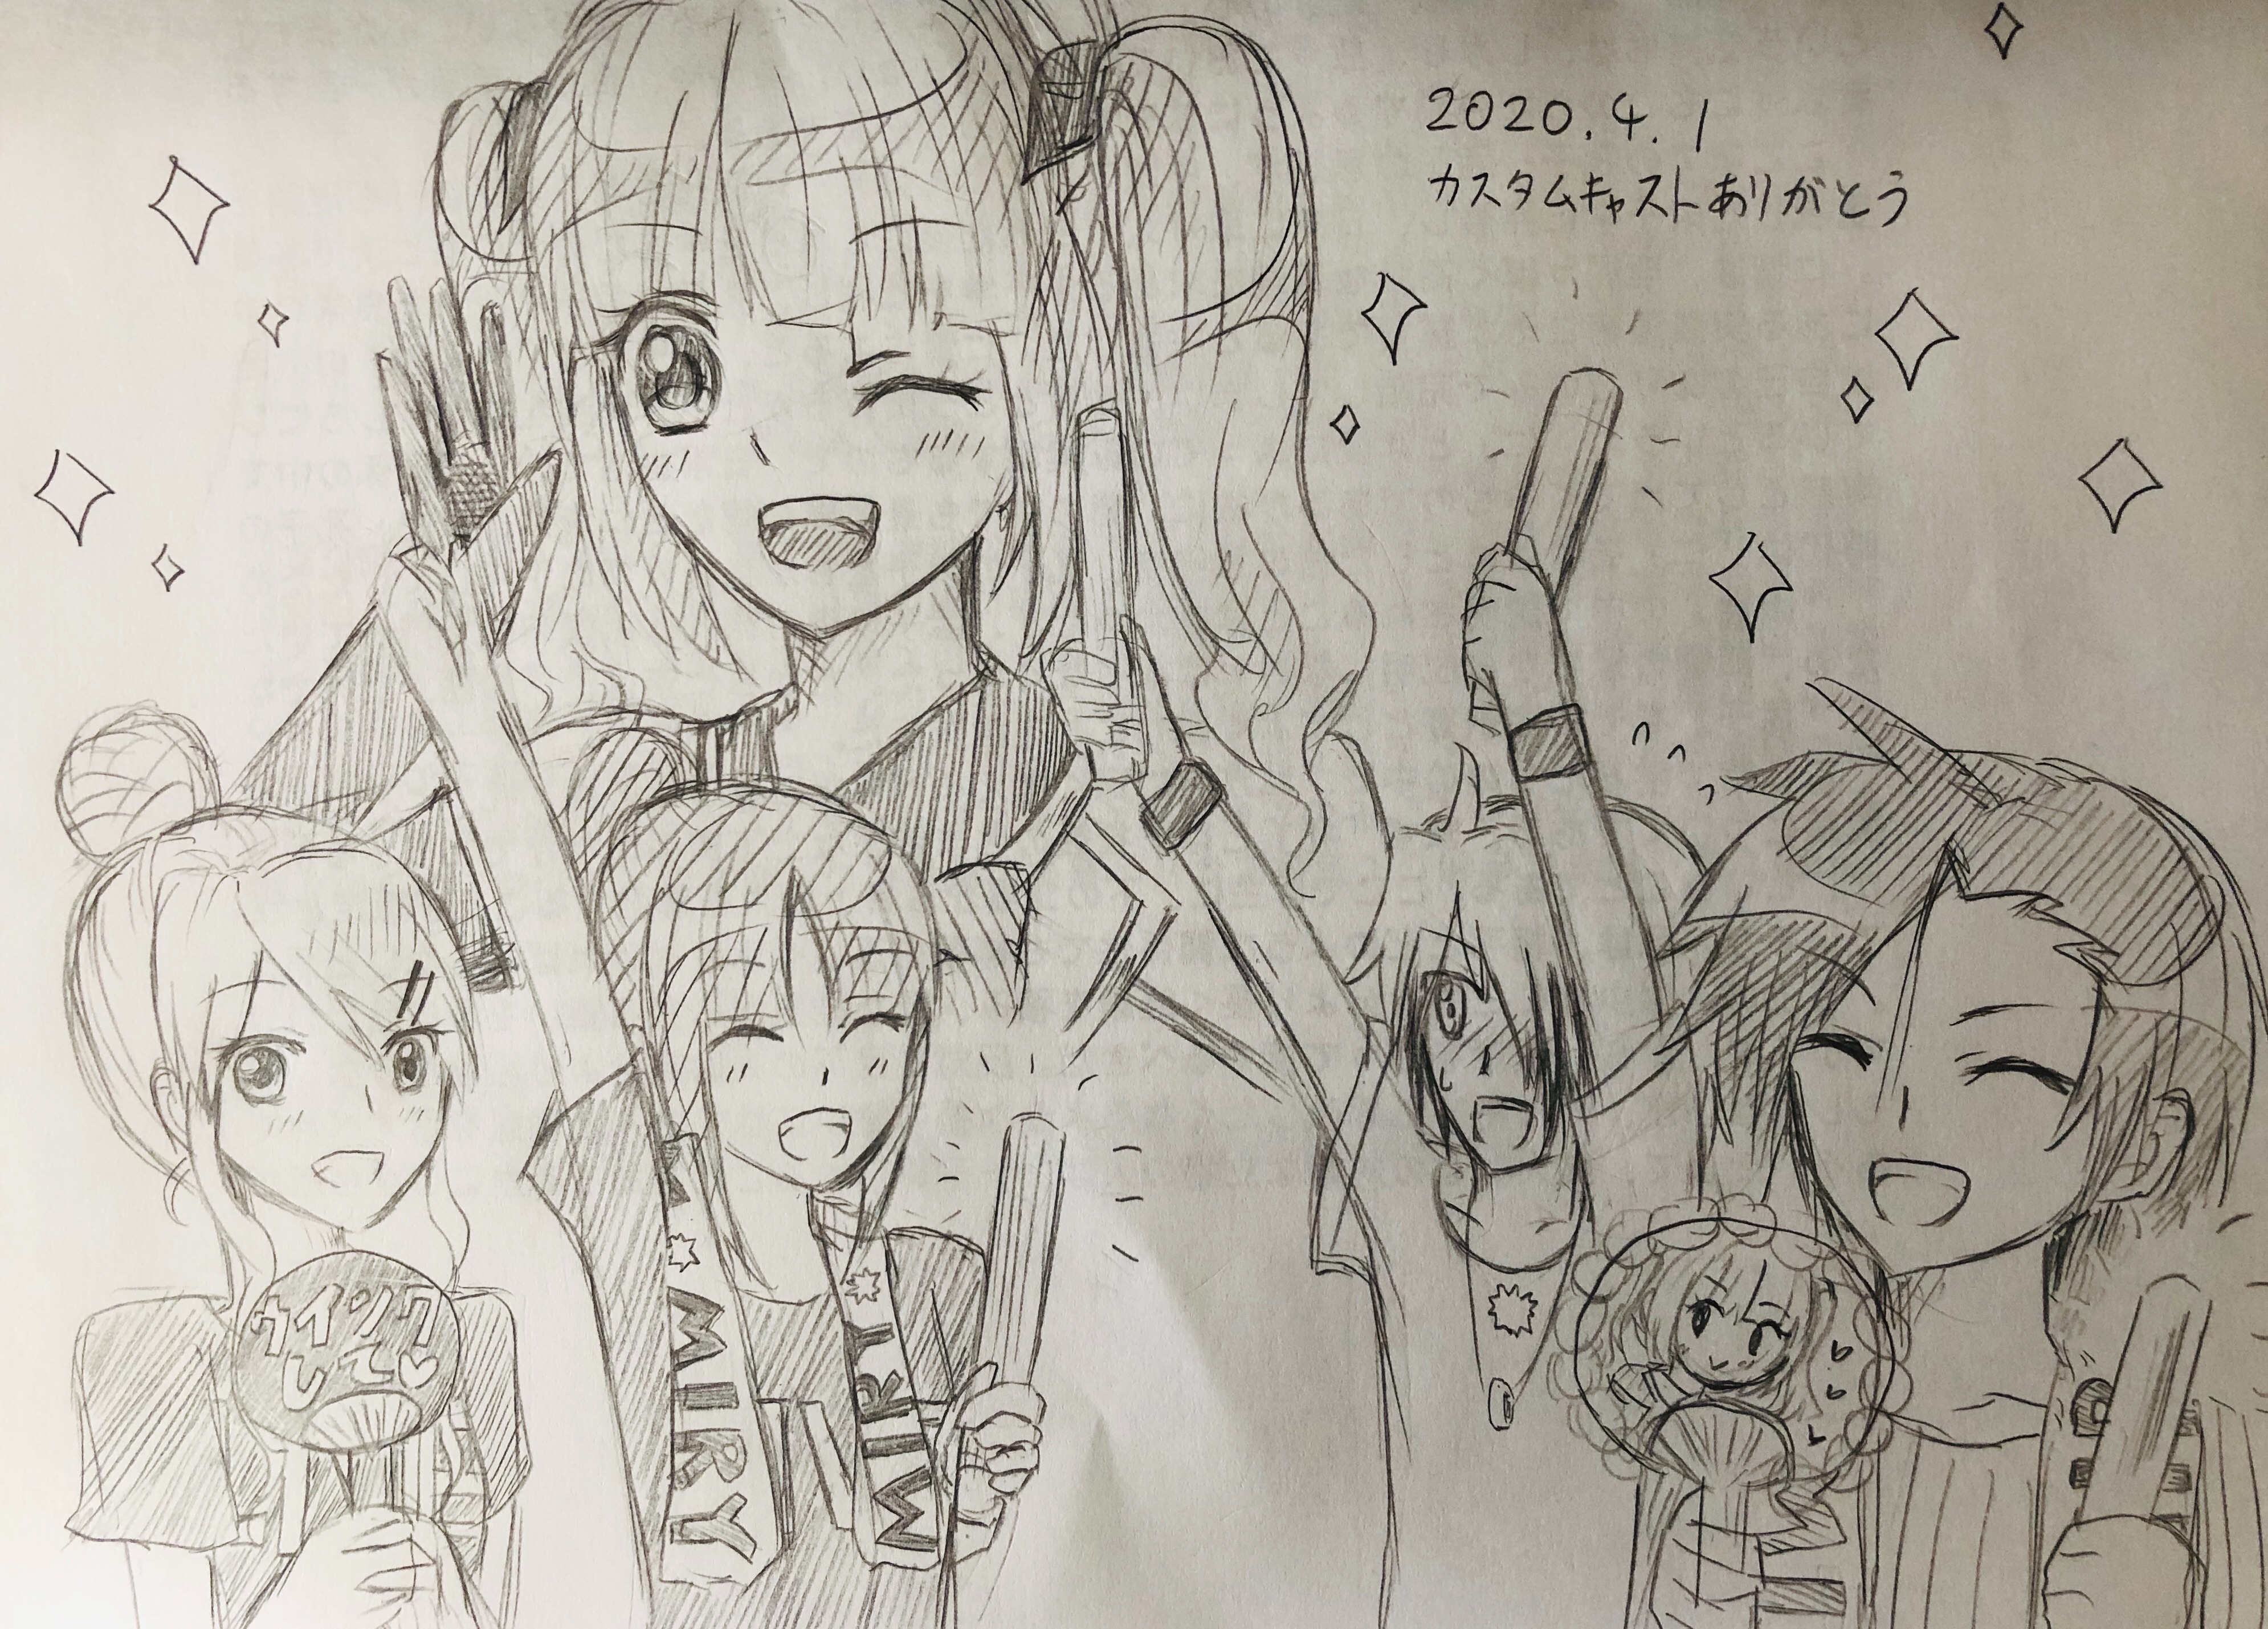 f:id:Yuki-19:20200407094719j:image